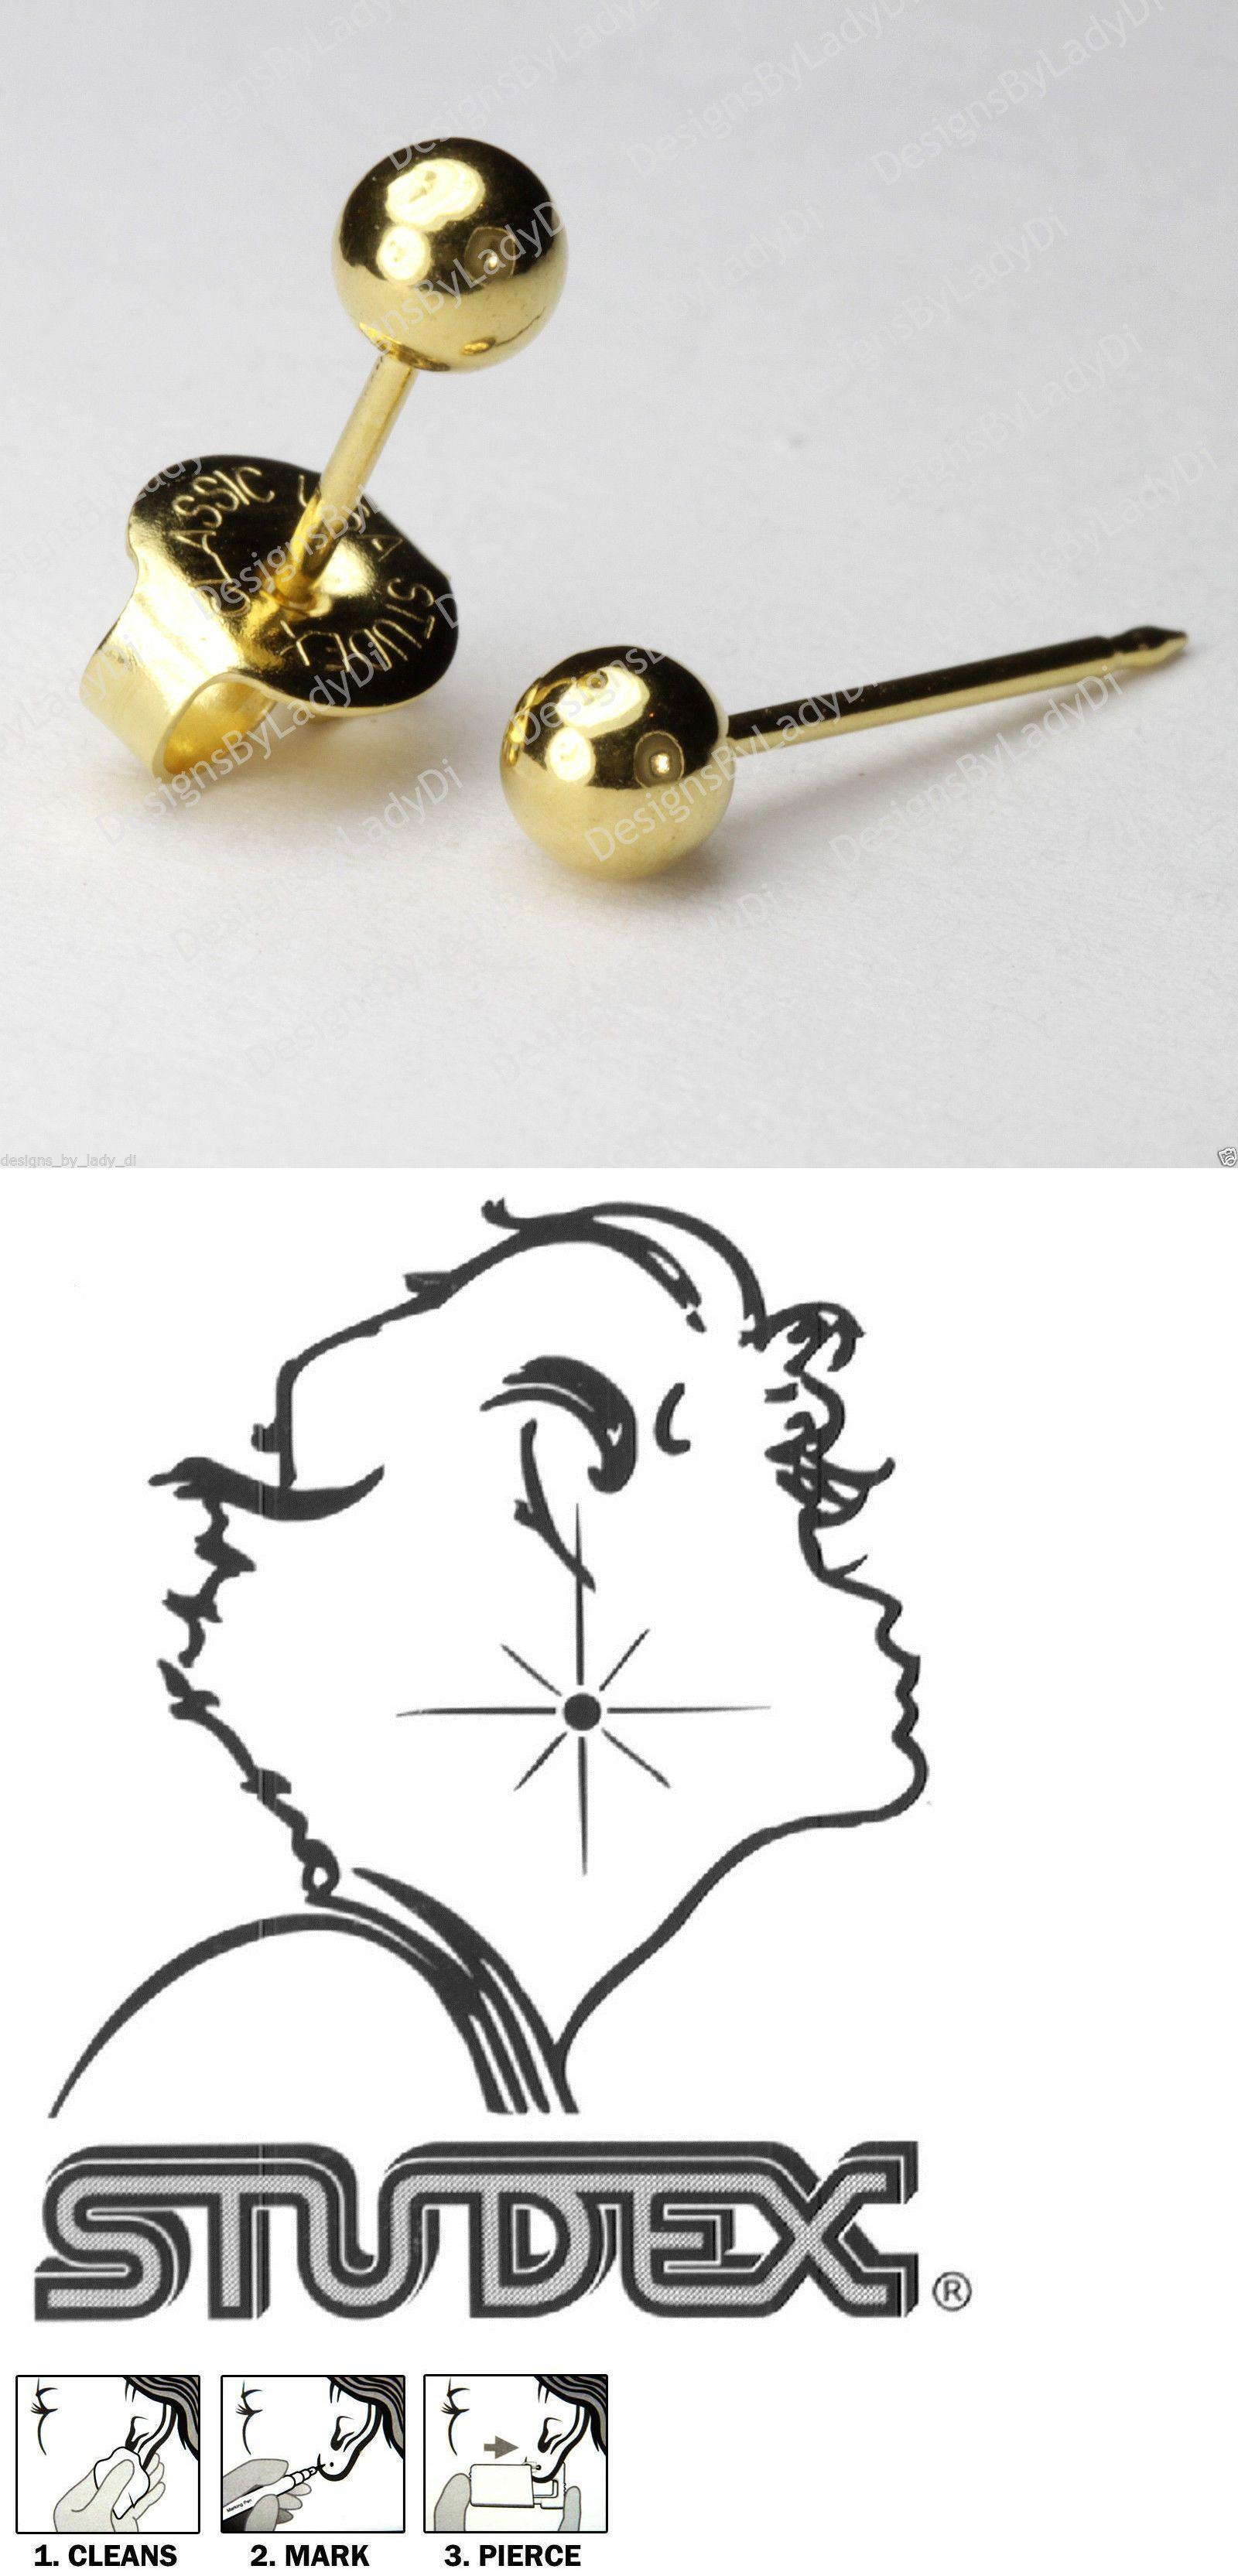 Nose piercing gun kit  LONG POST kt Gold mm Round Ball Studs Ear Piercing Earrings